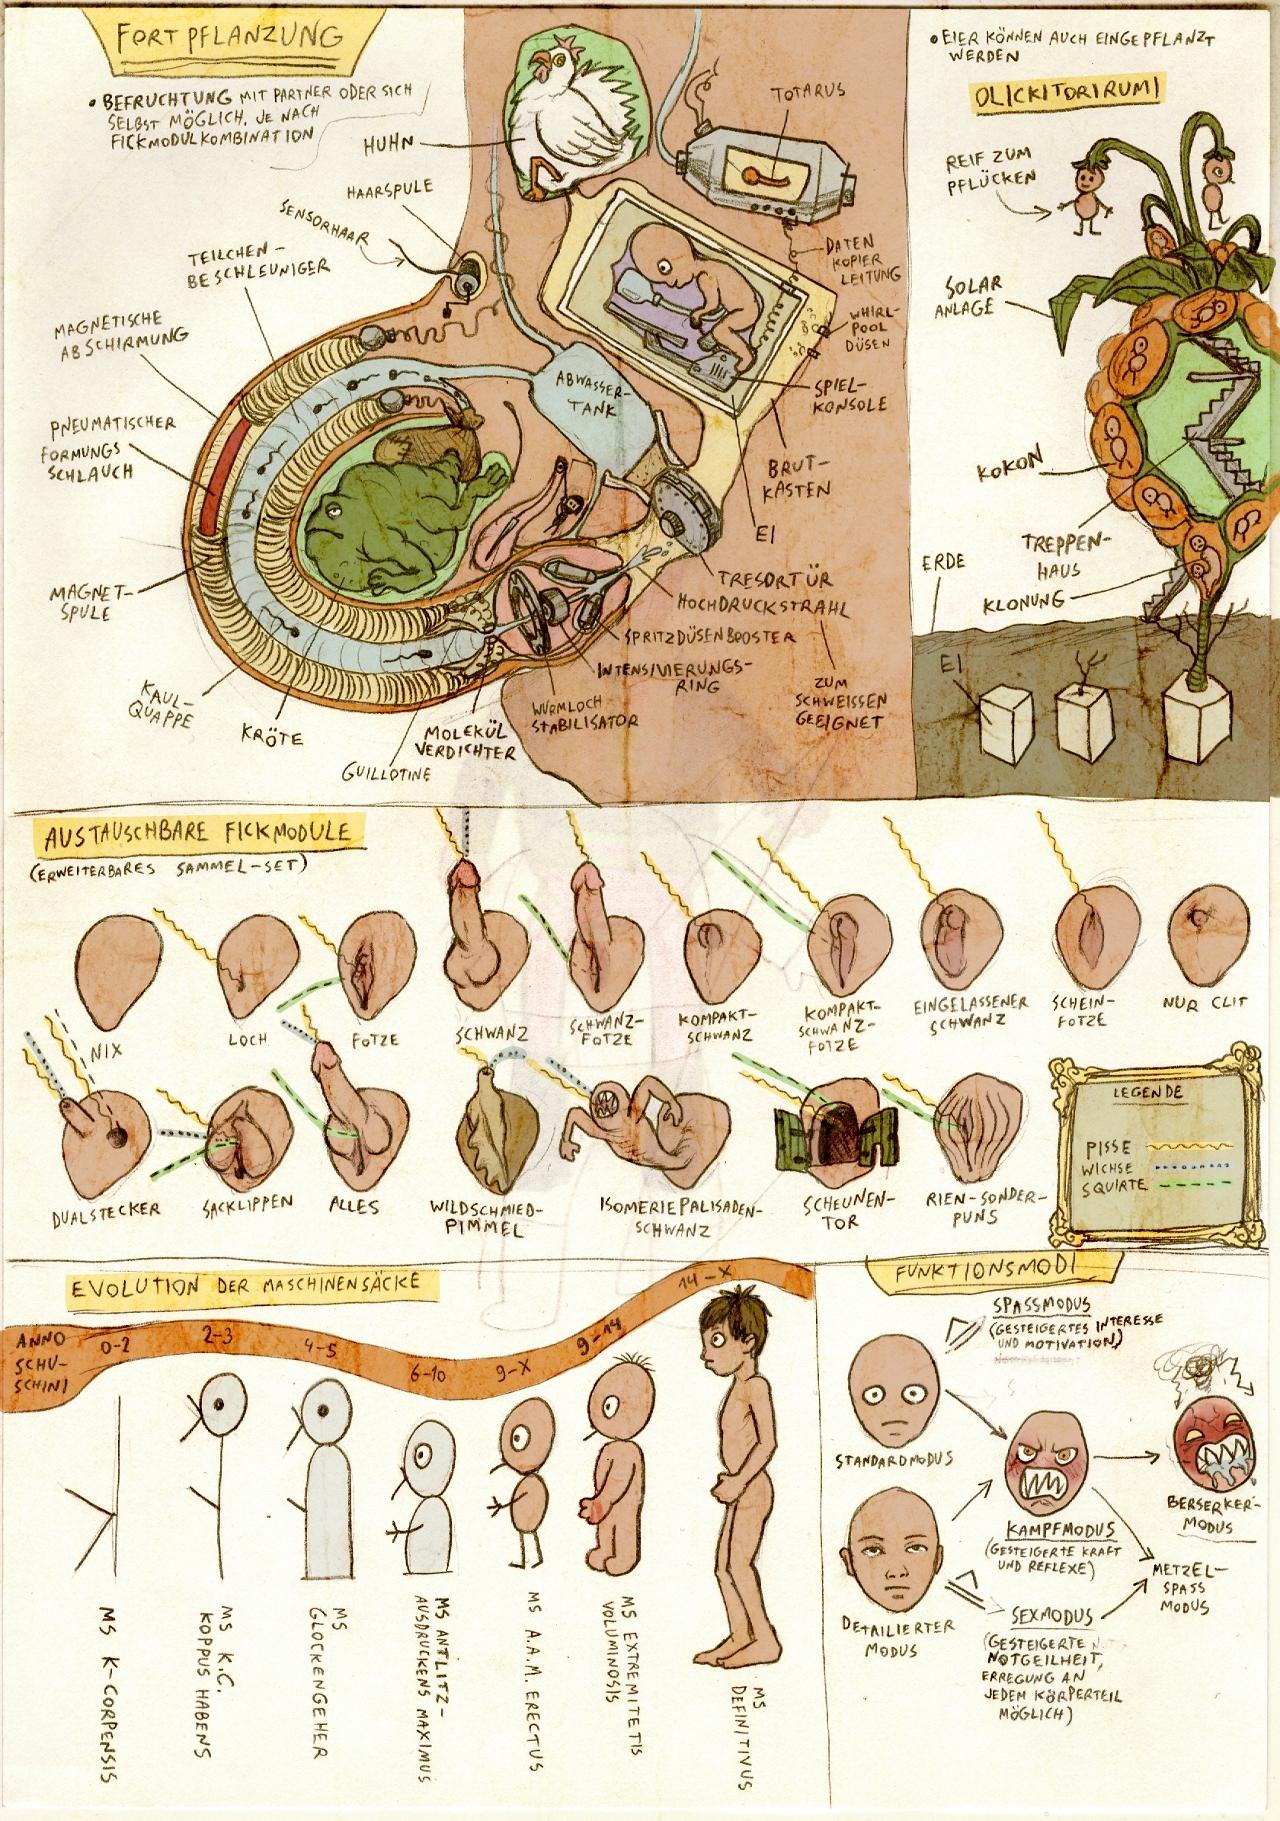 Anatomy 4: Procreation